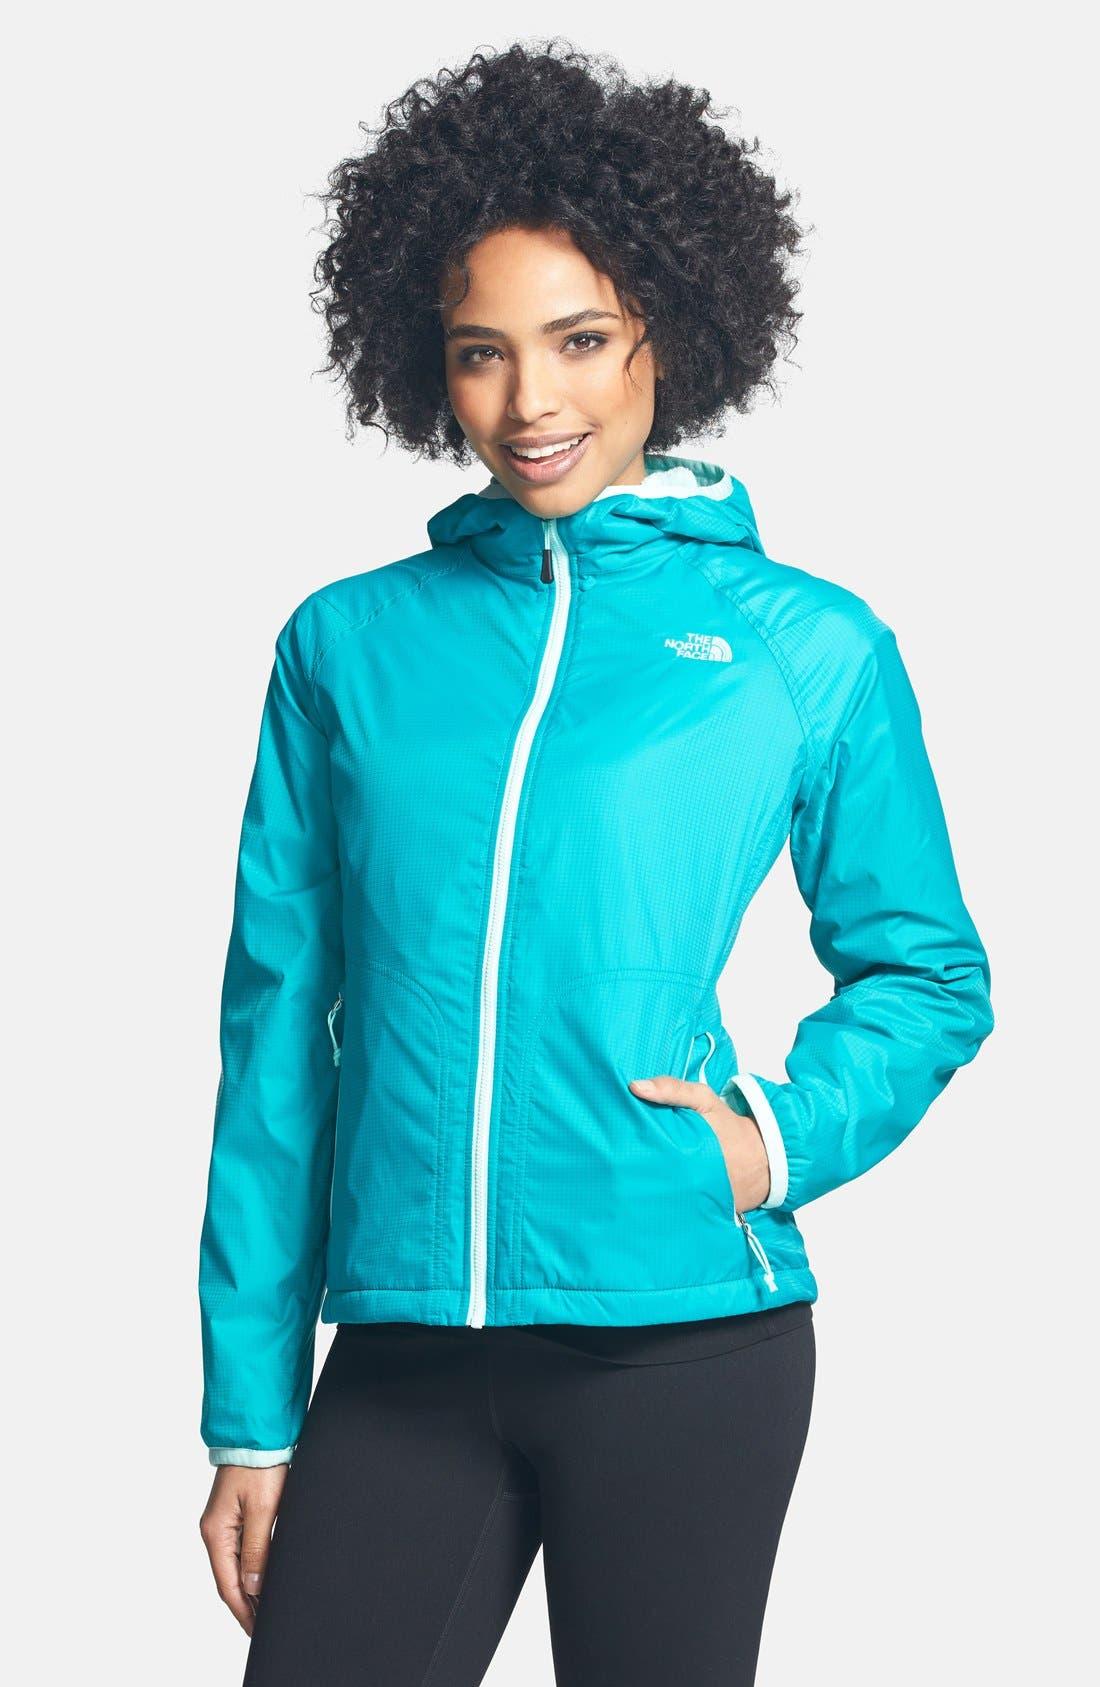 Alternate Image 1 Selected - The North Face 'Pitaya Swirl' Hooded Jacket